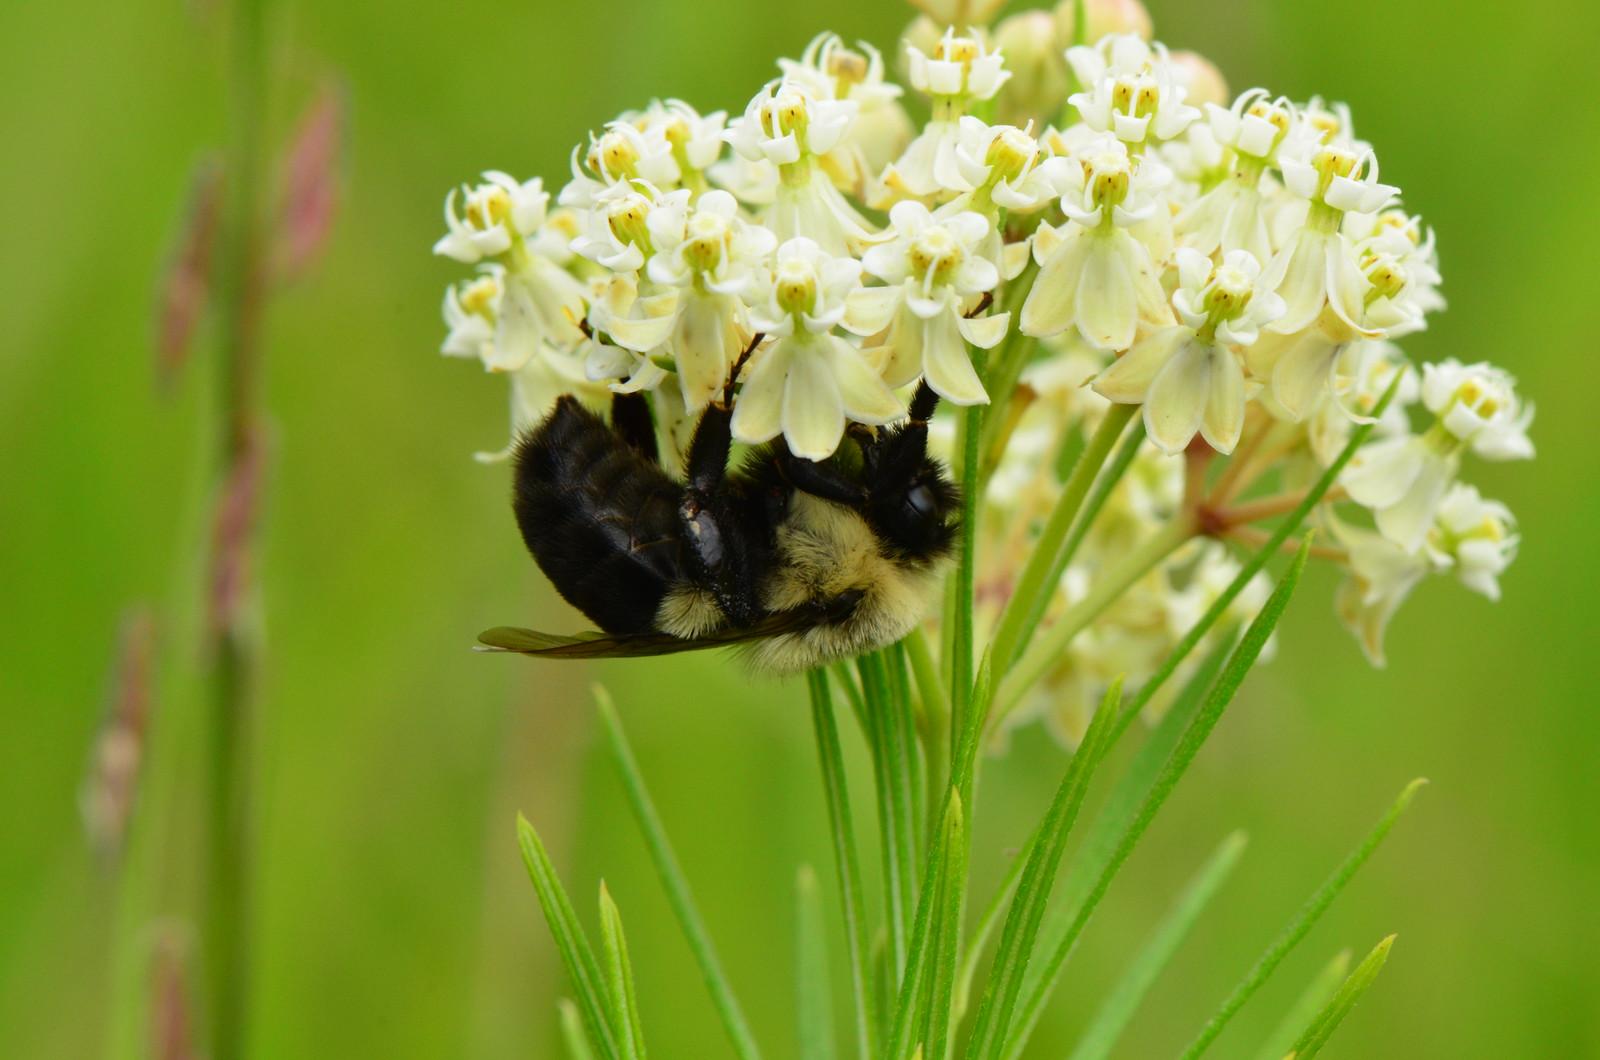 Bee on Whorled Milkweed (Asclepias verticillata)